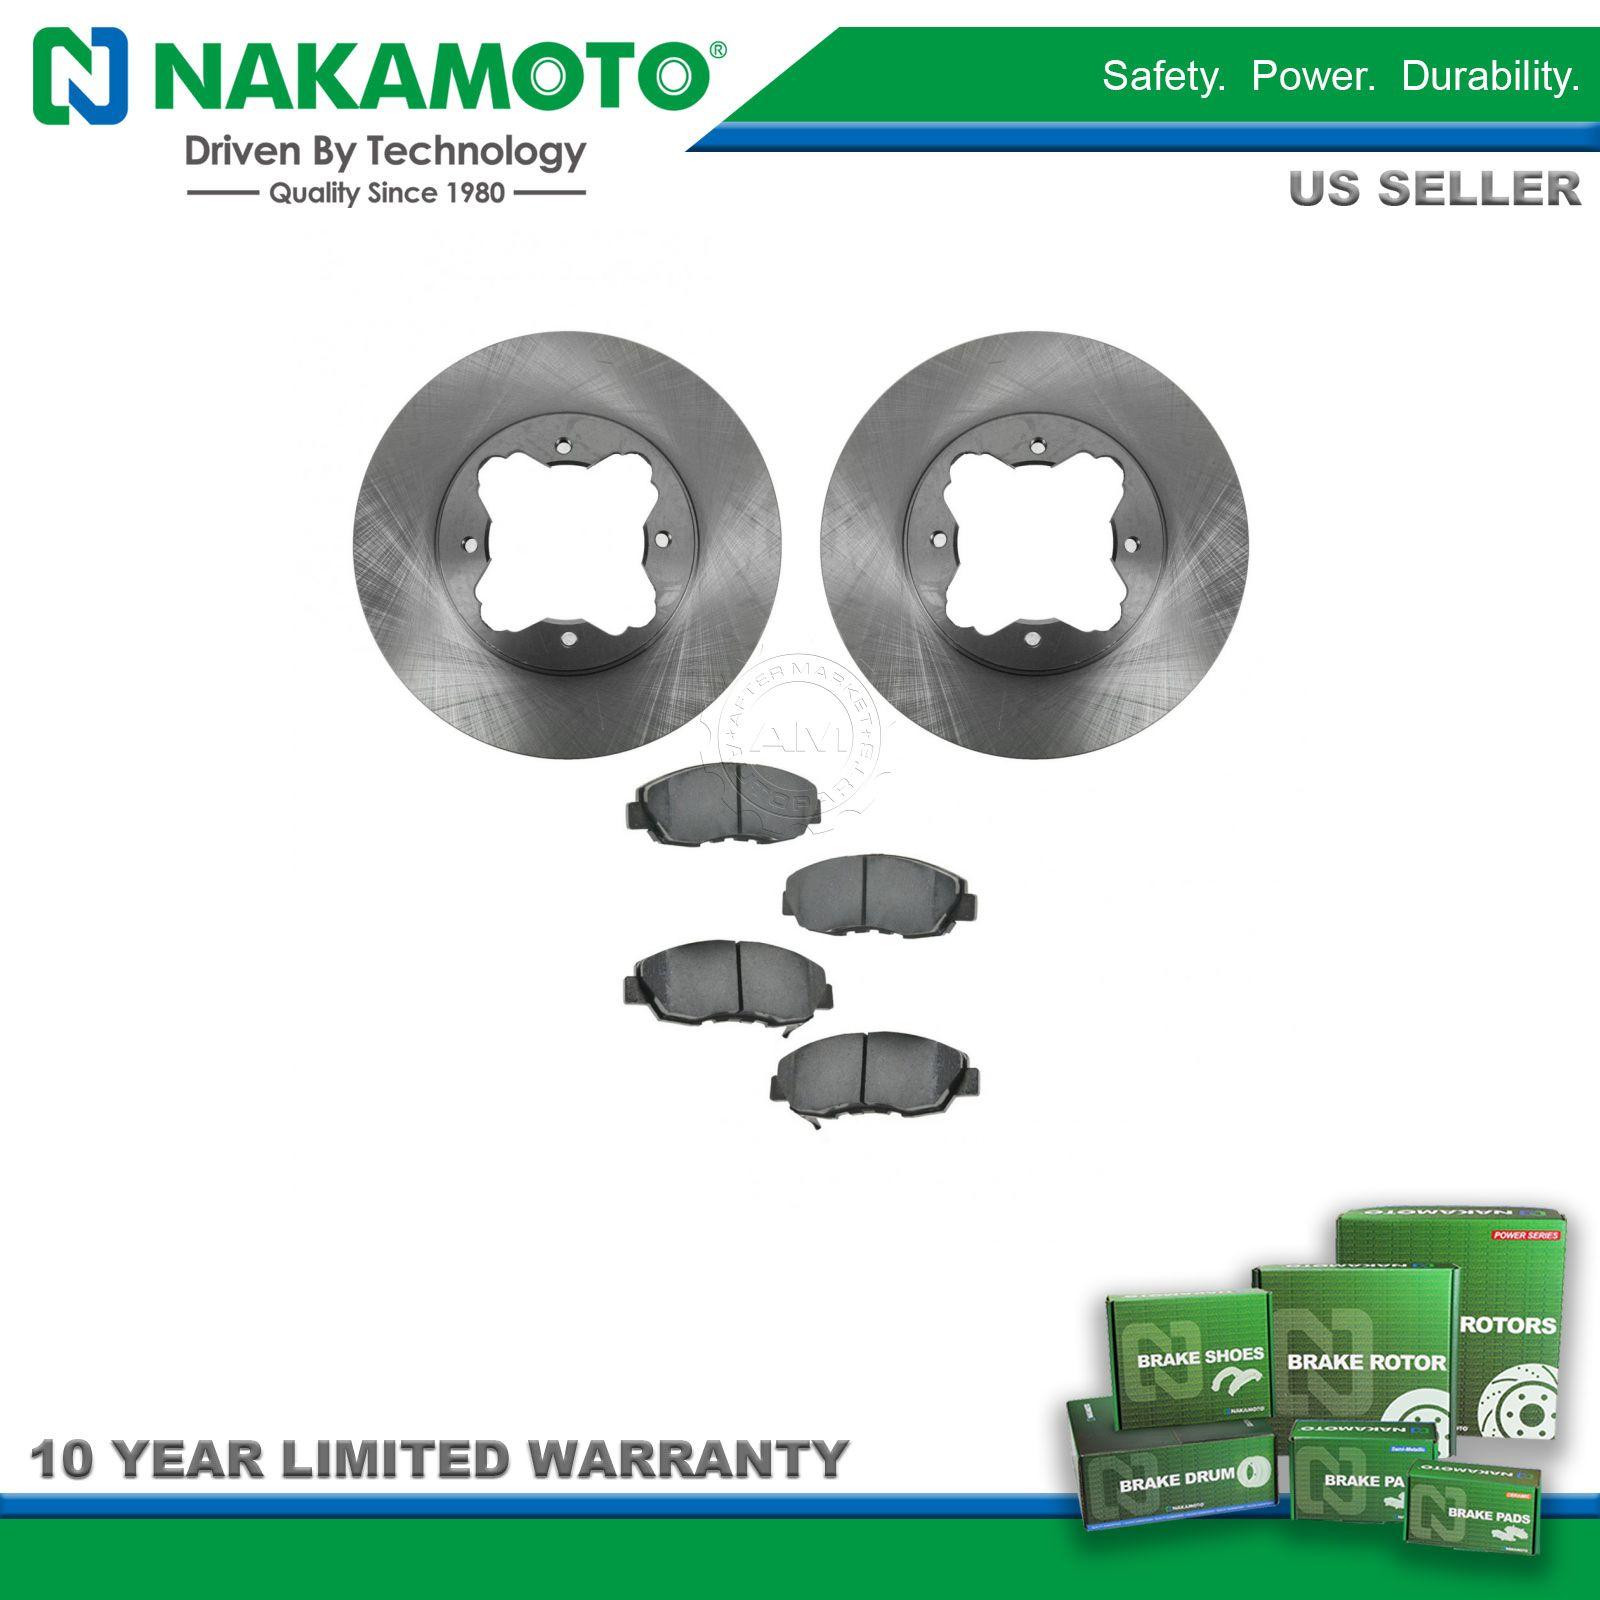 Nakamoto Front Disc Premium Posi Ceramic Brake Pads & Rotors Kit for Acura  Honda